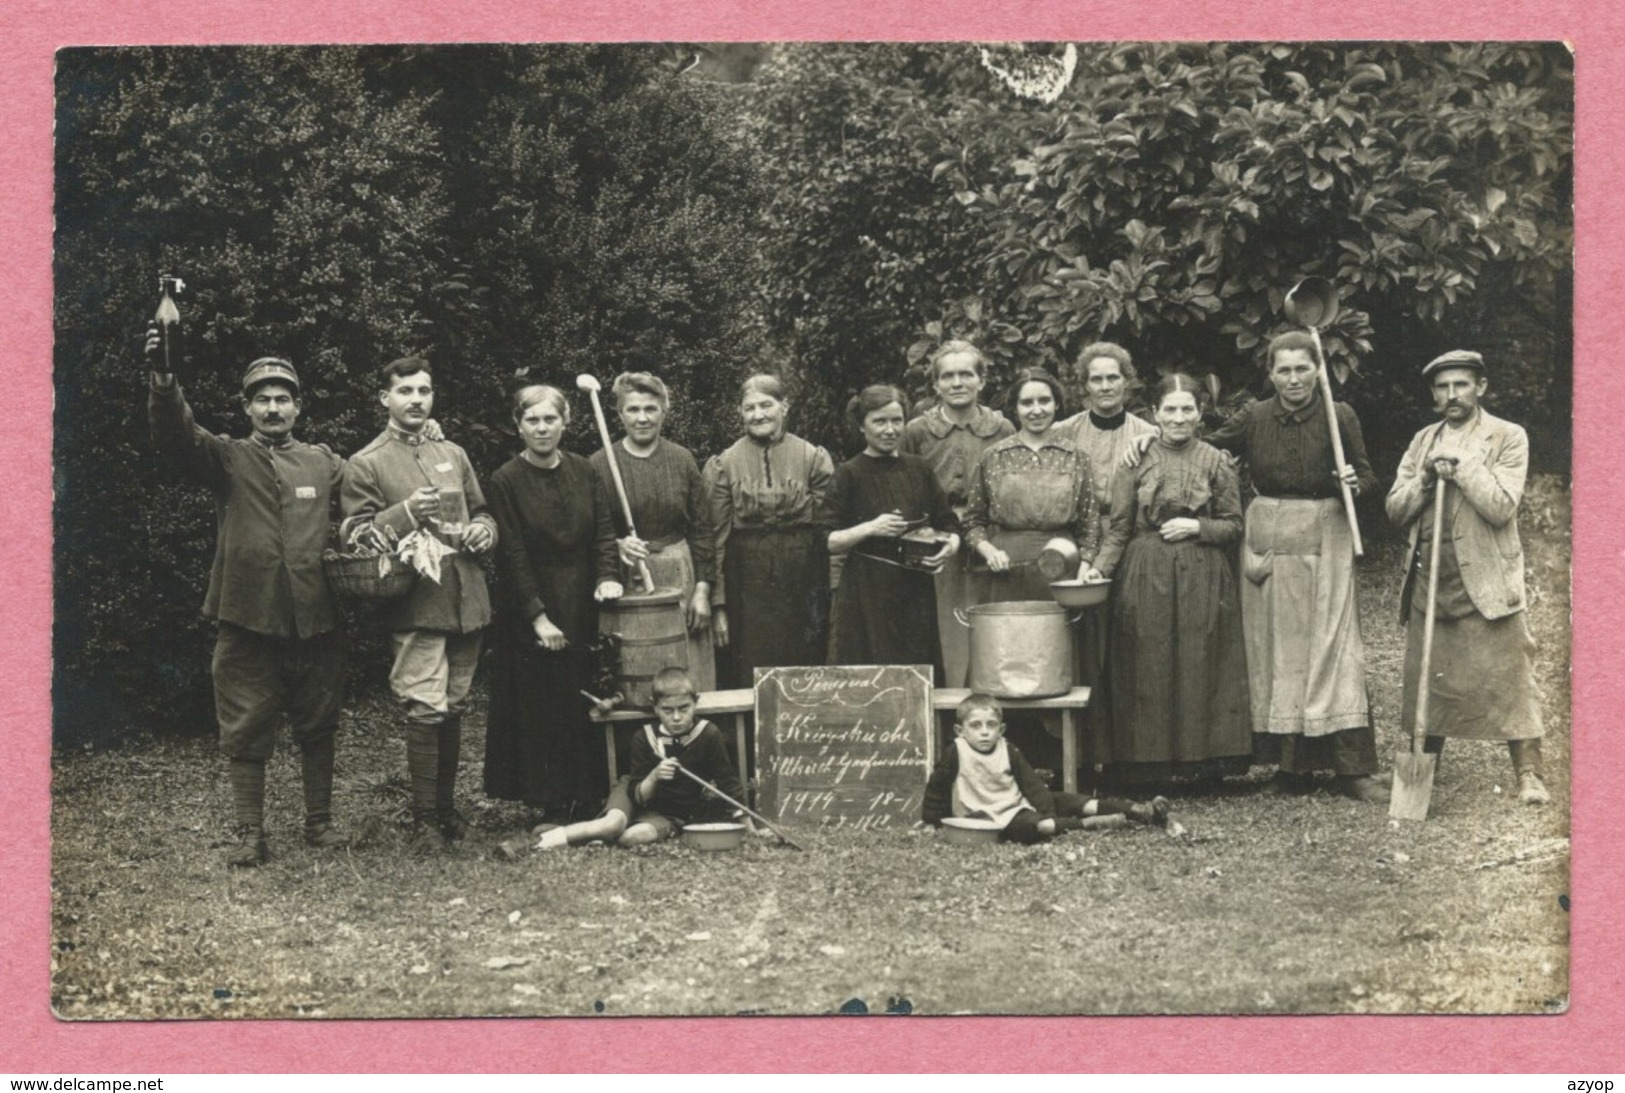 67 - ILLKIRCH-GRAFFENSTADEN - Carte Photo - Personal - Kriegsküche - Guerre 14/18 - 3 Scans - Francia